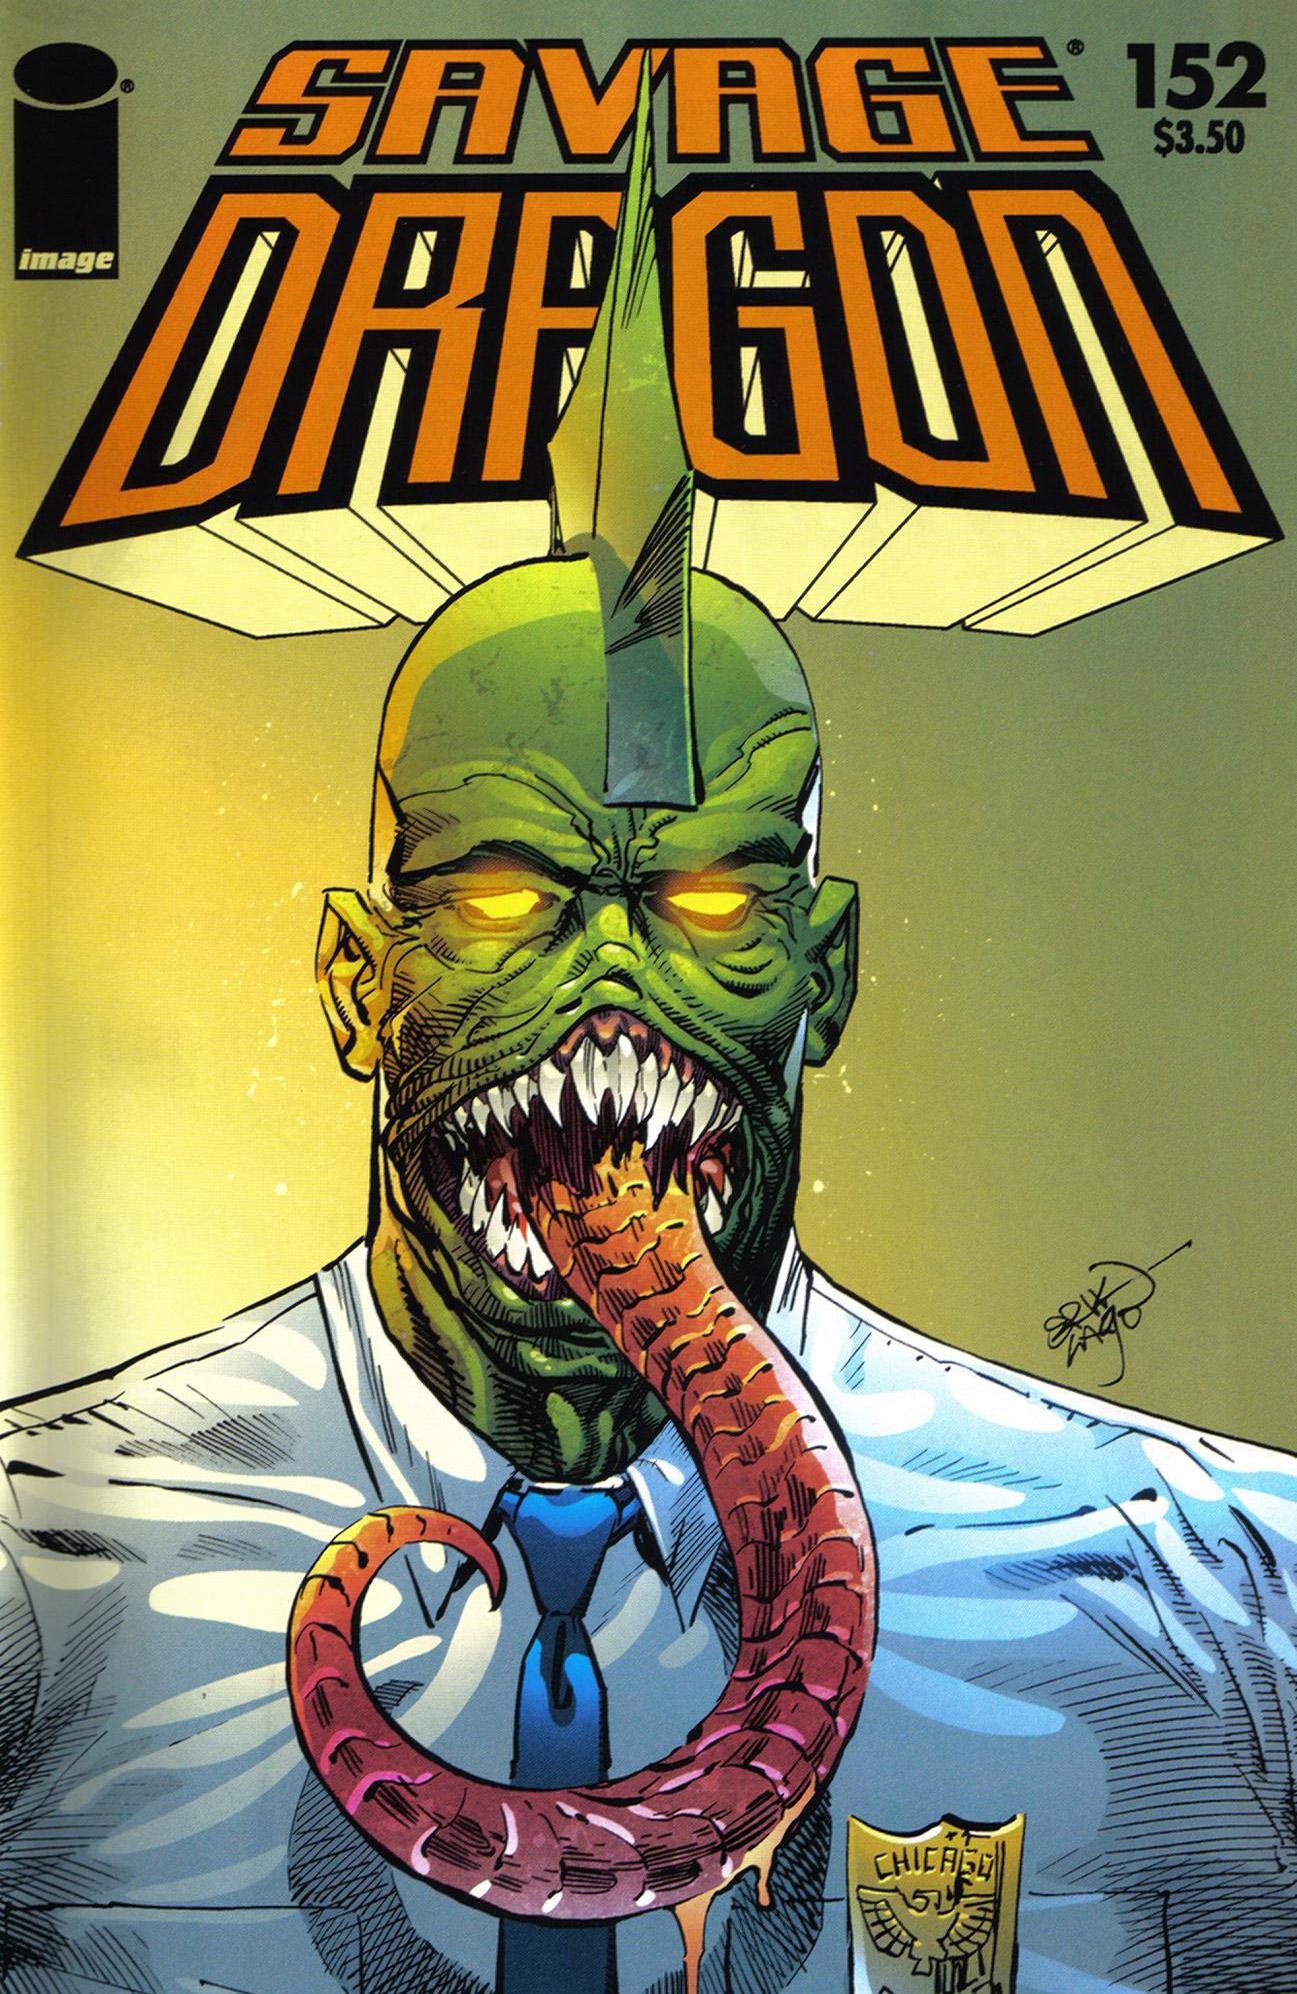 Cover Savage Dragon Vol.2 #152